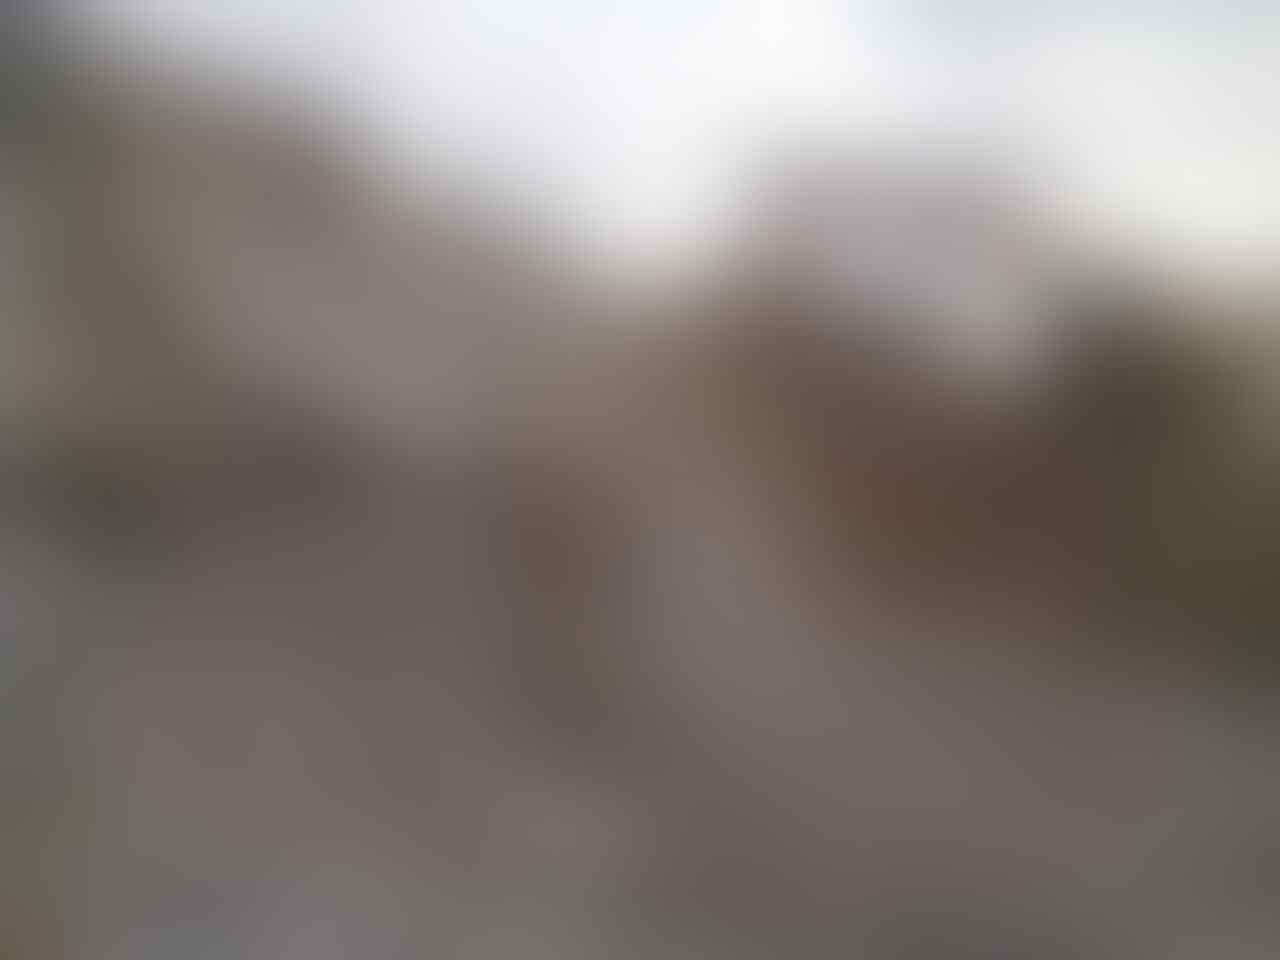 [Ask] Beli Pasir Silika dimana sihhhh